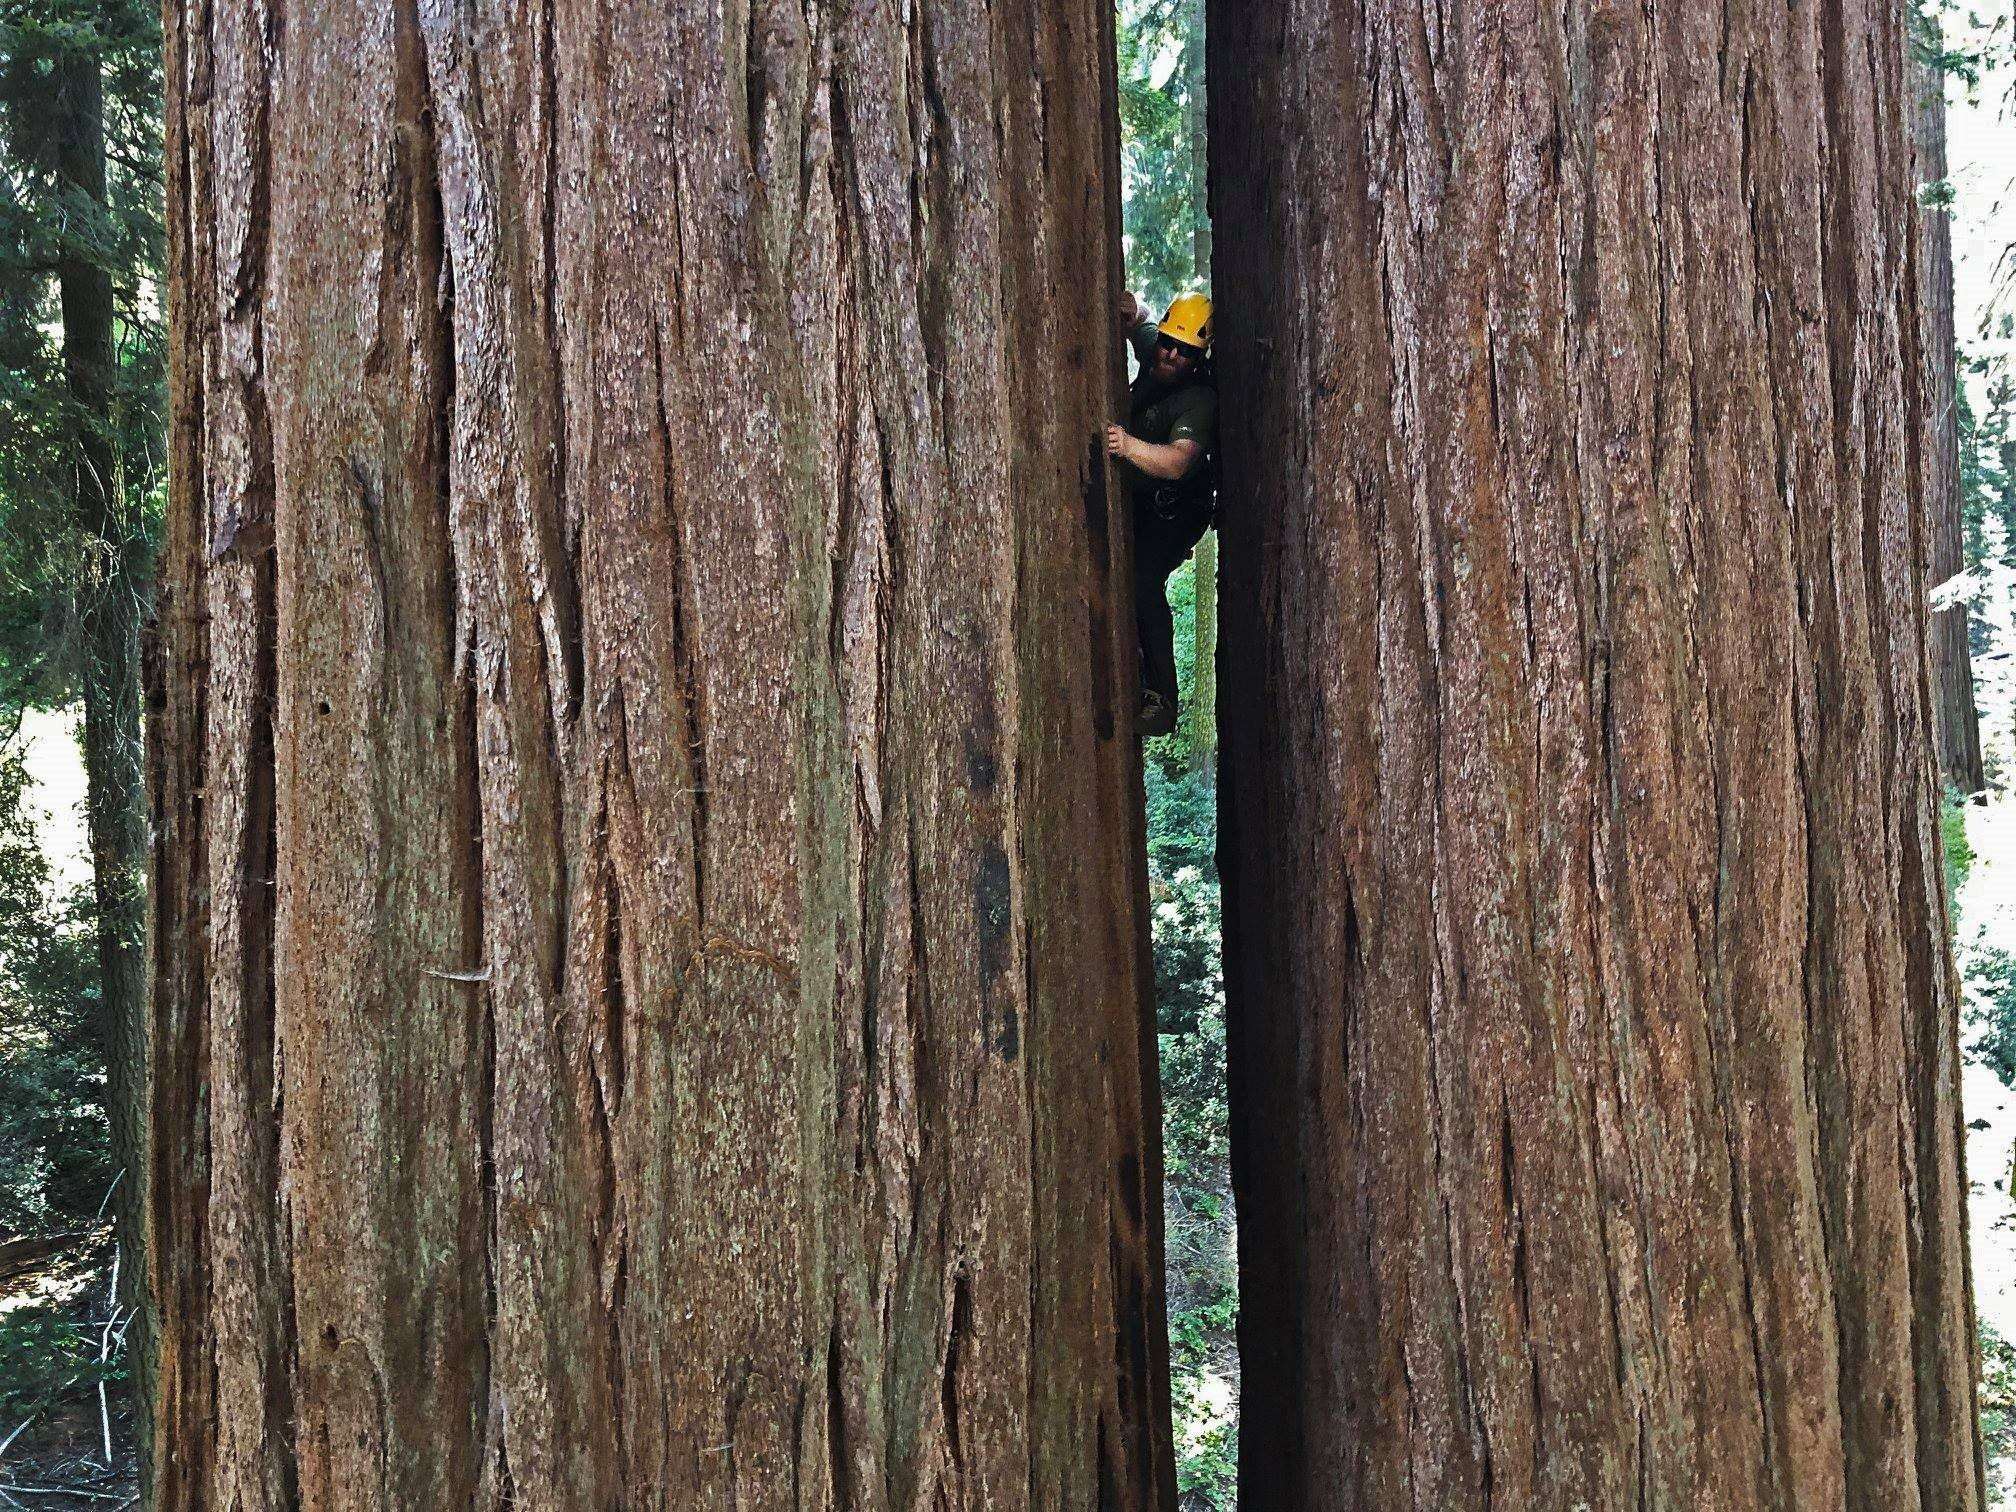 climbing at the tree